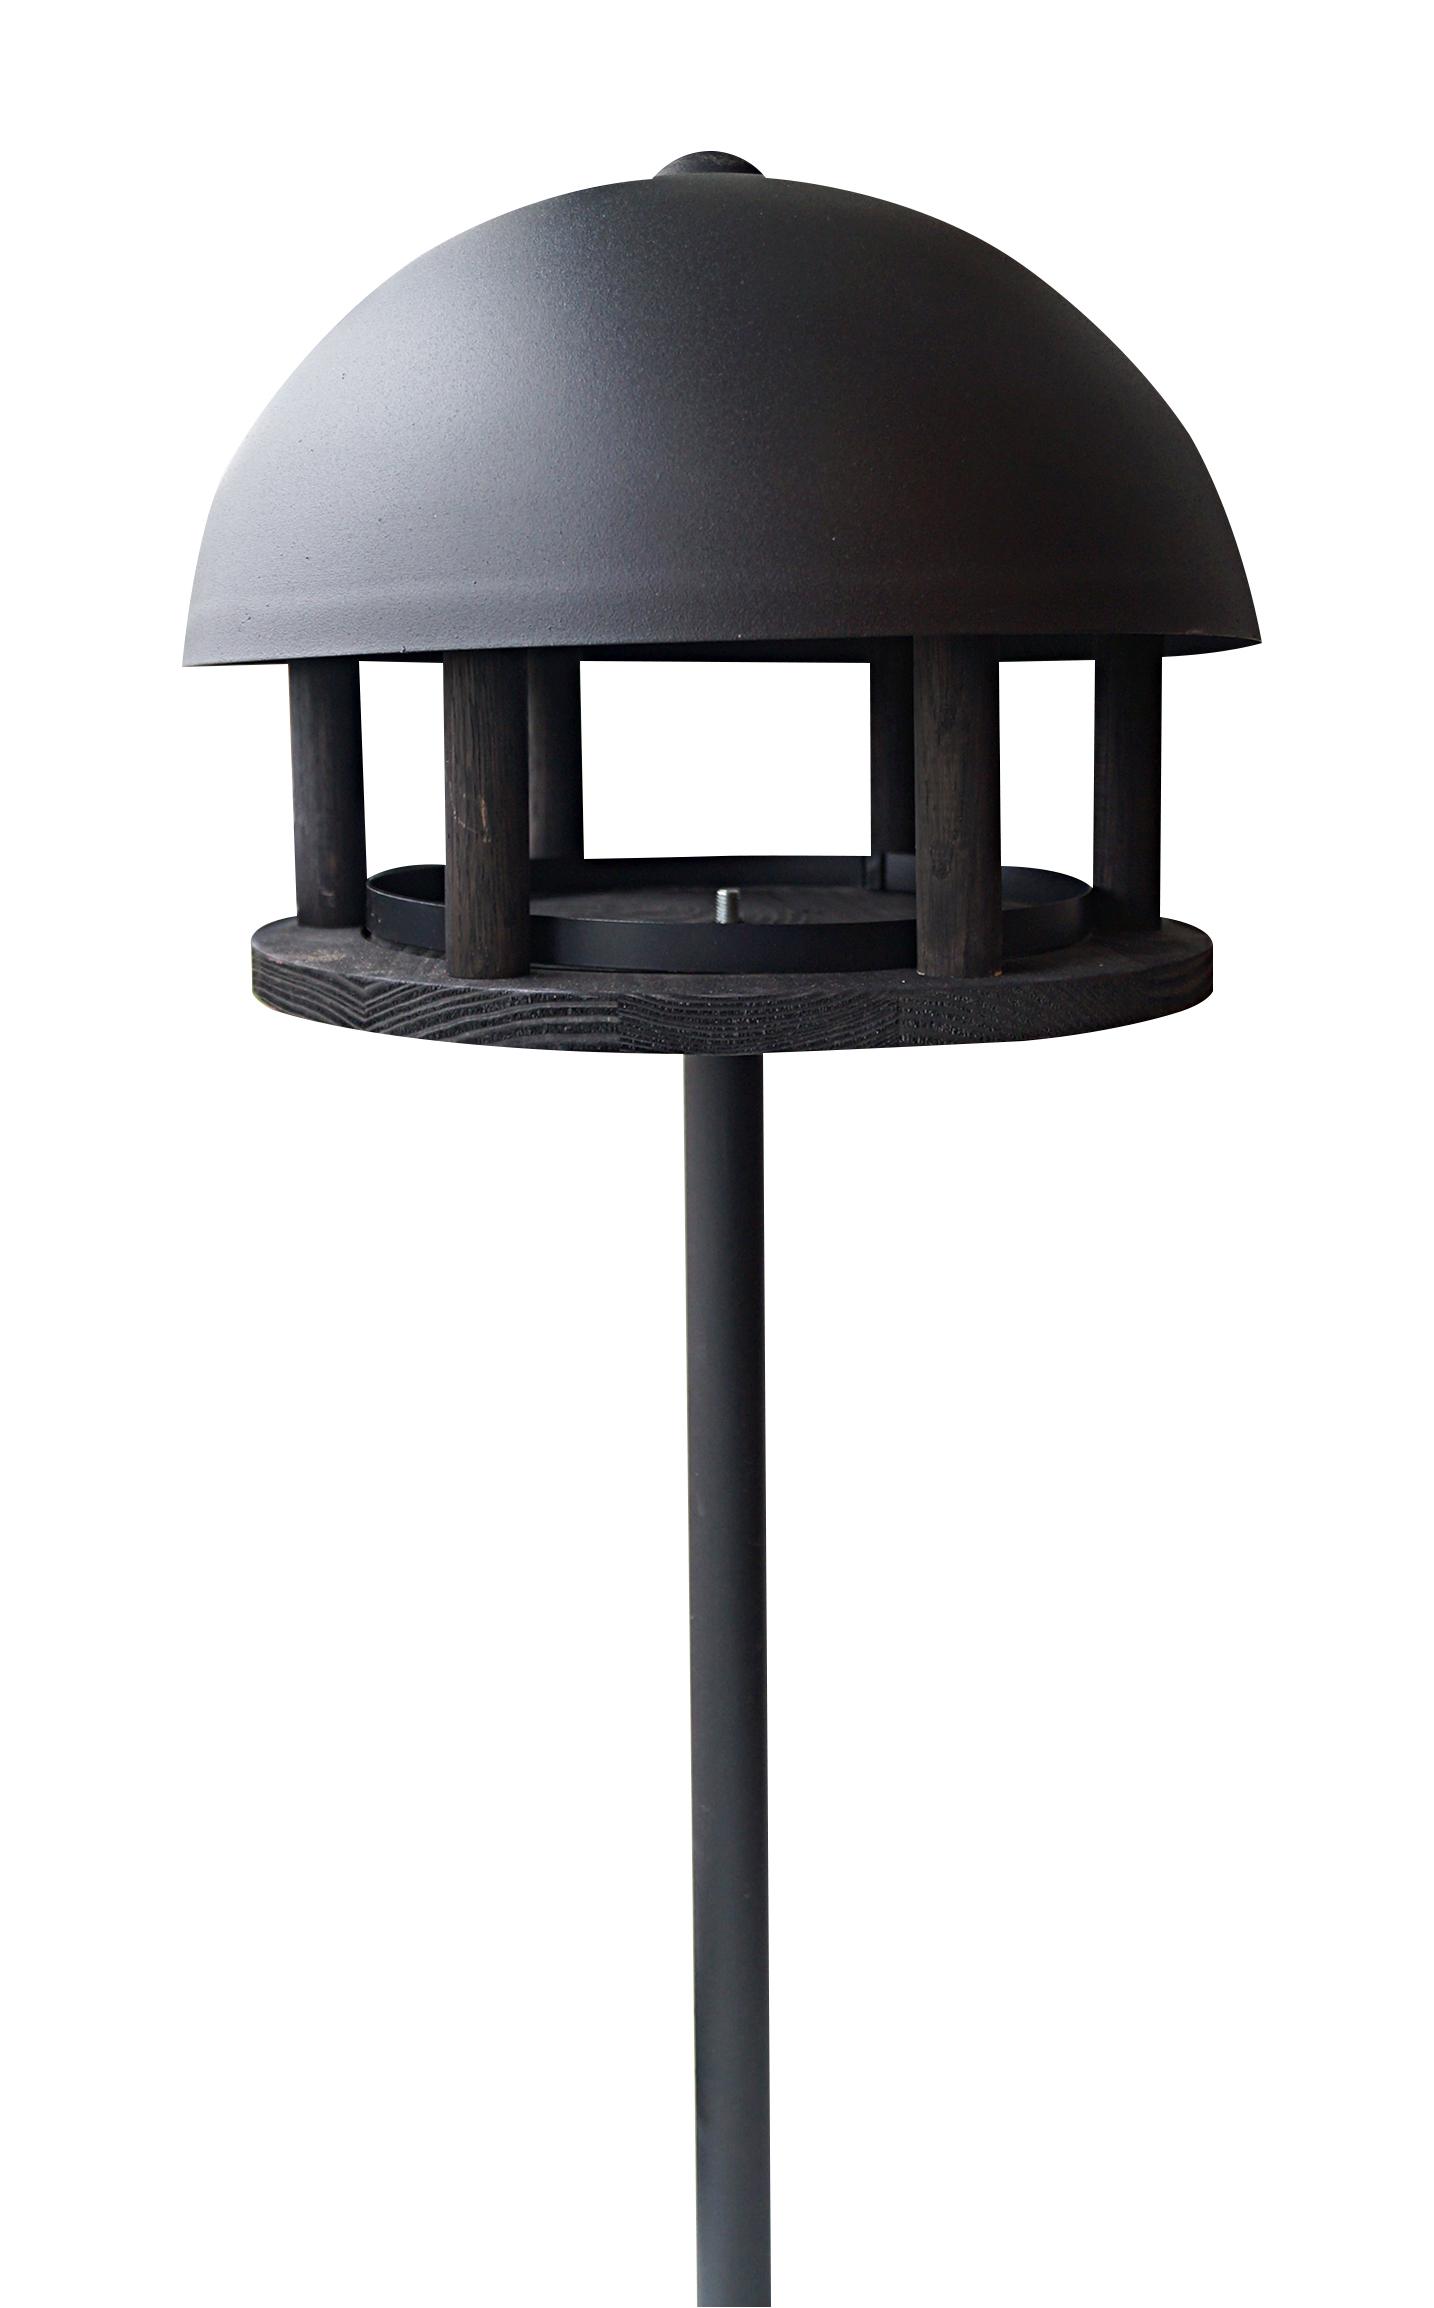 Gardenlife - Dome Black Bird House With Spear (125515)